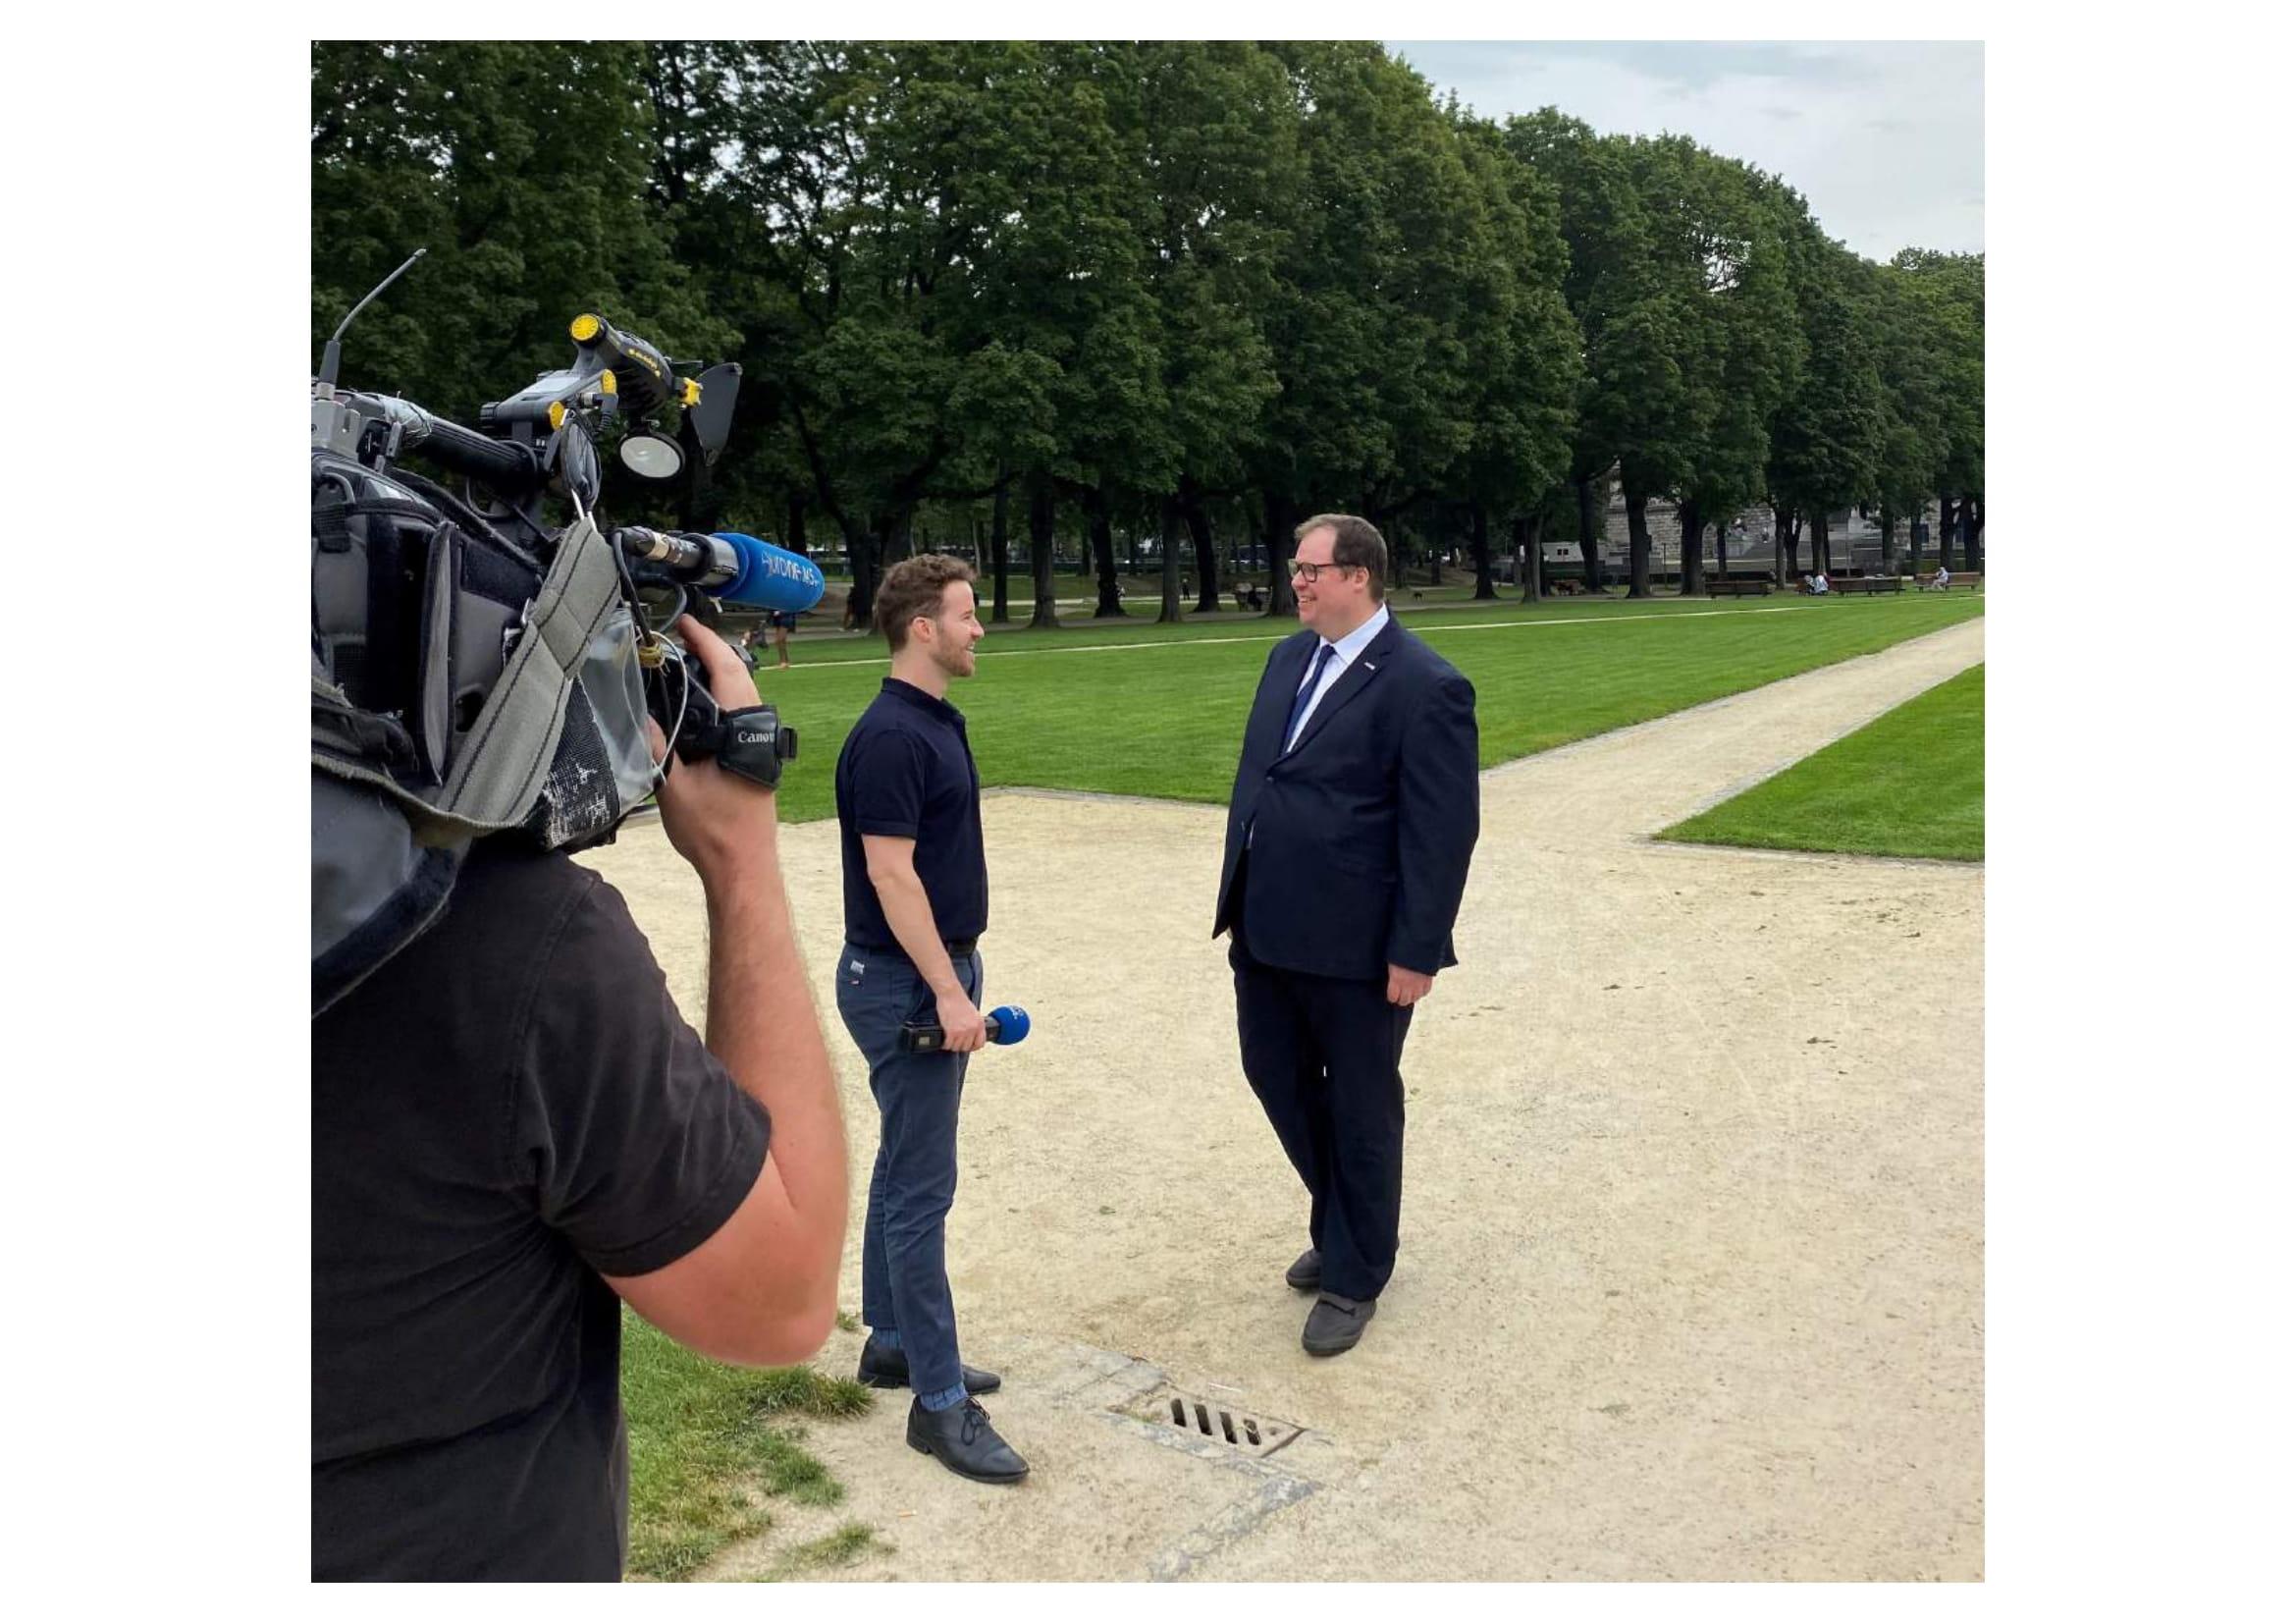 Eurocadres President Martin Jefflén speaking with Euronews reporter Christopher Pitchers